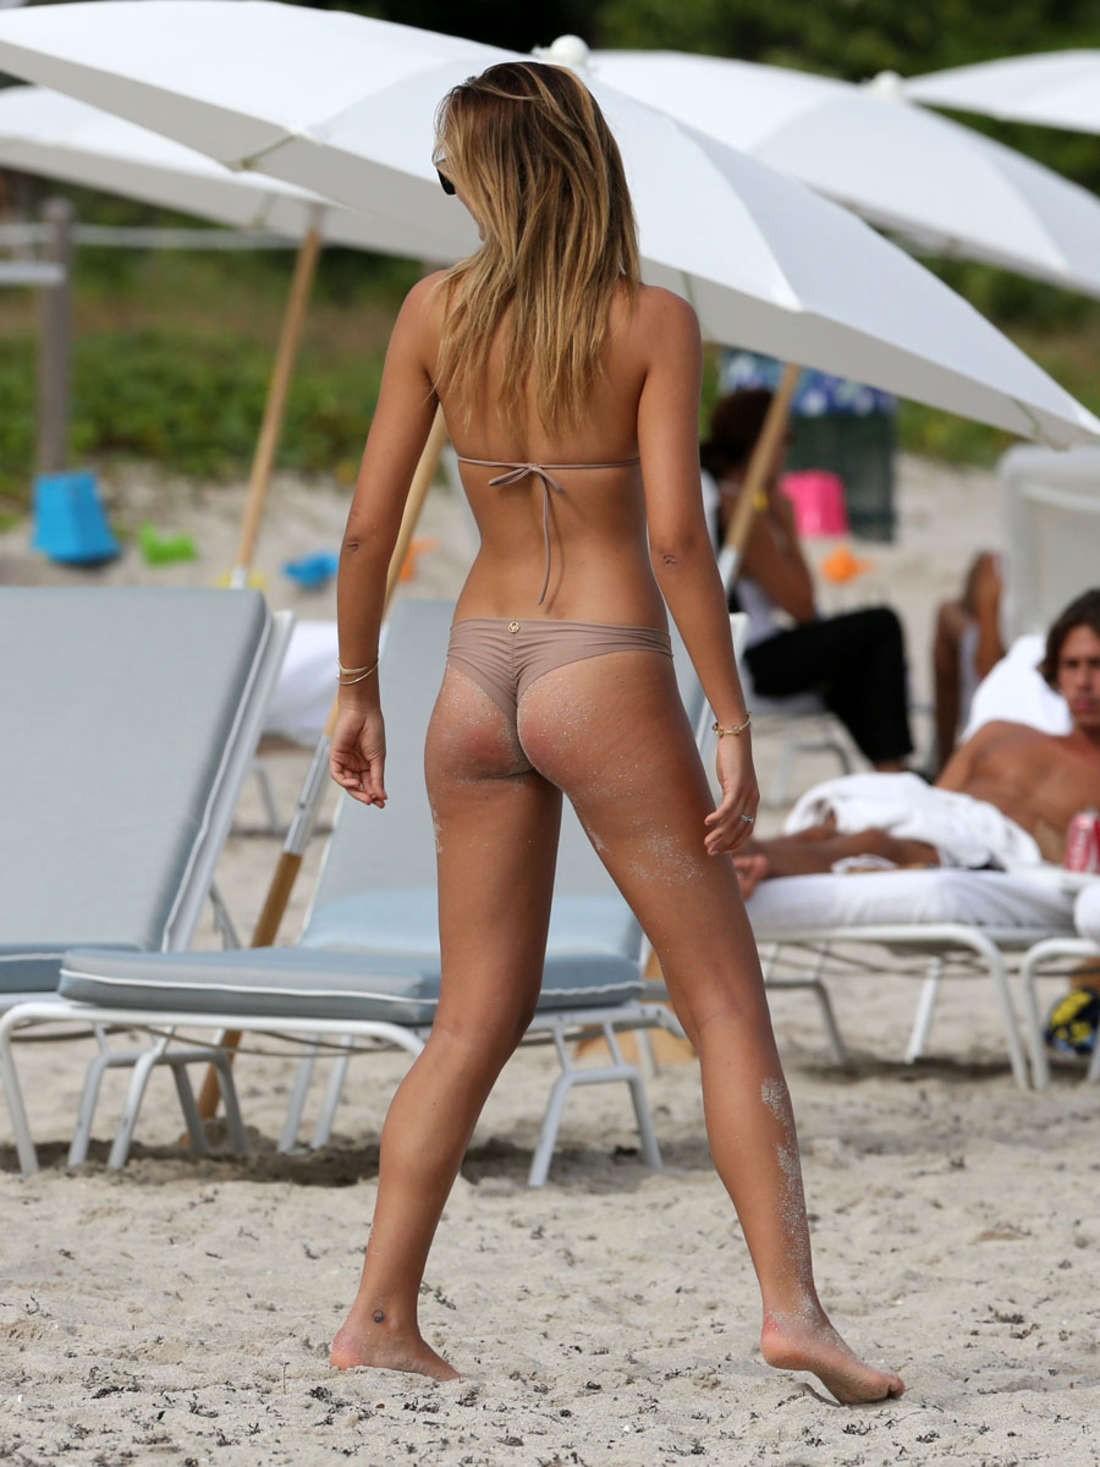 Sandra Kubicka Desnuda Página 4 Fotos Desnuda Descuido Topless